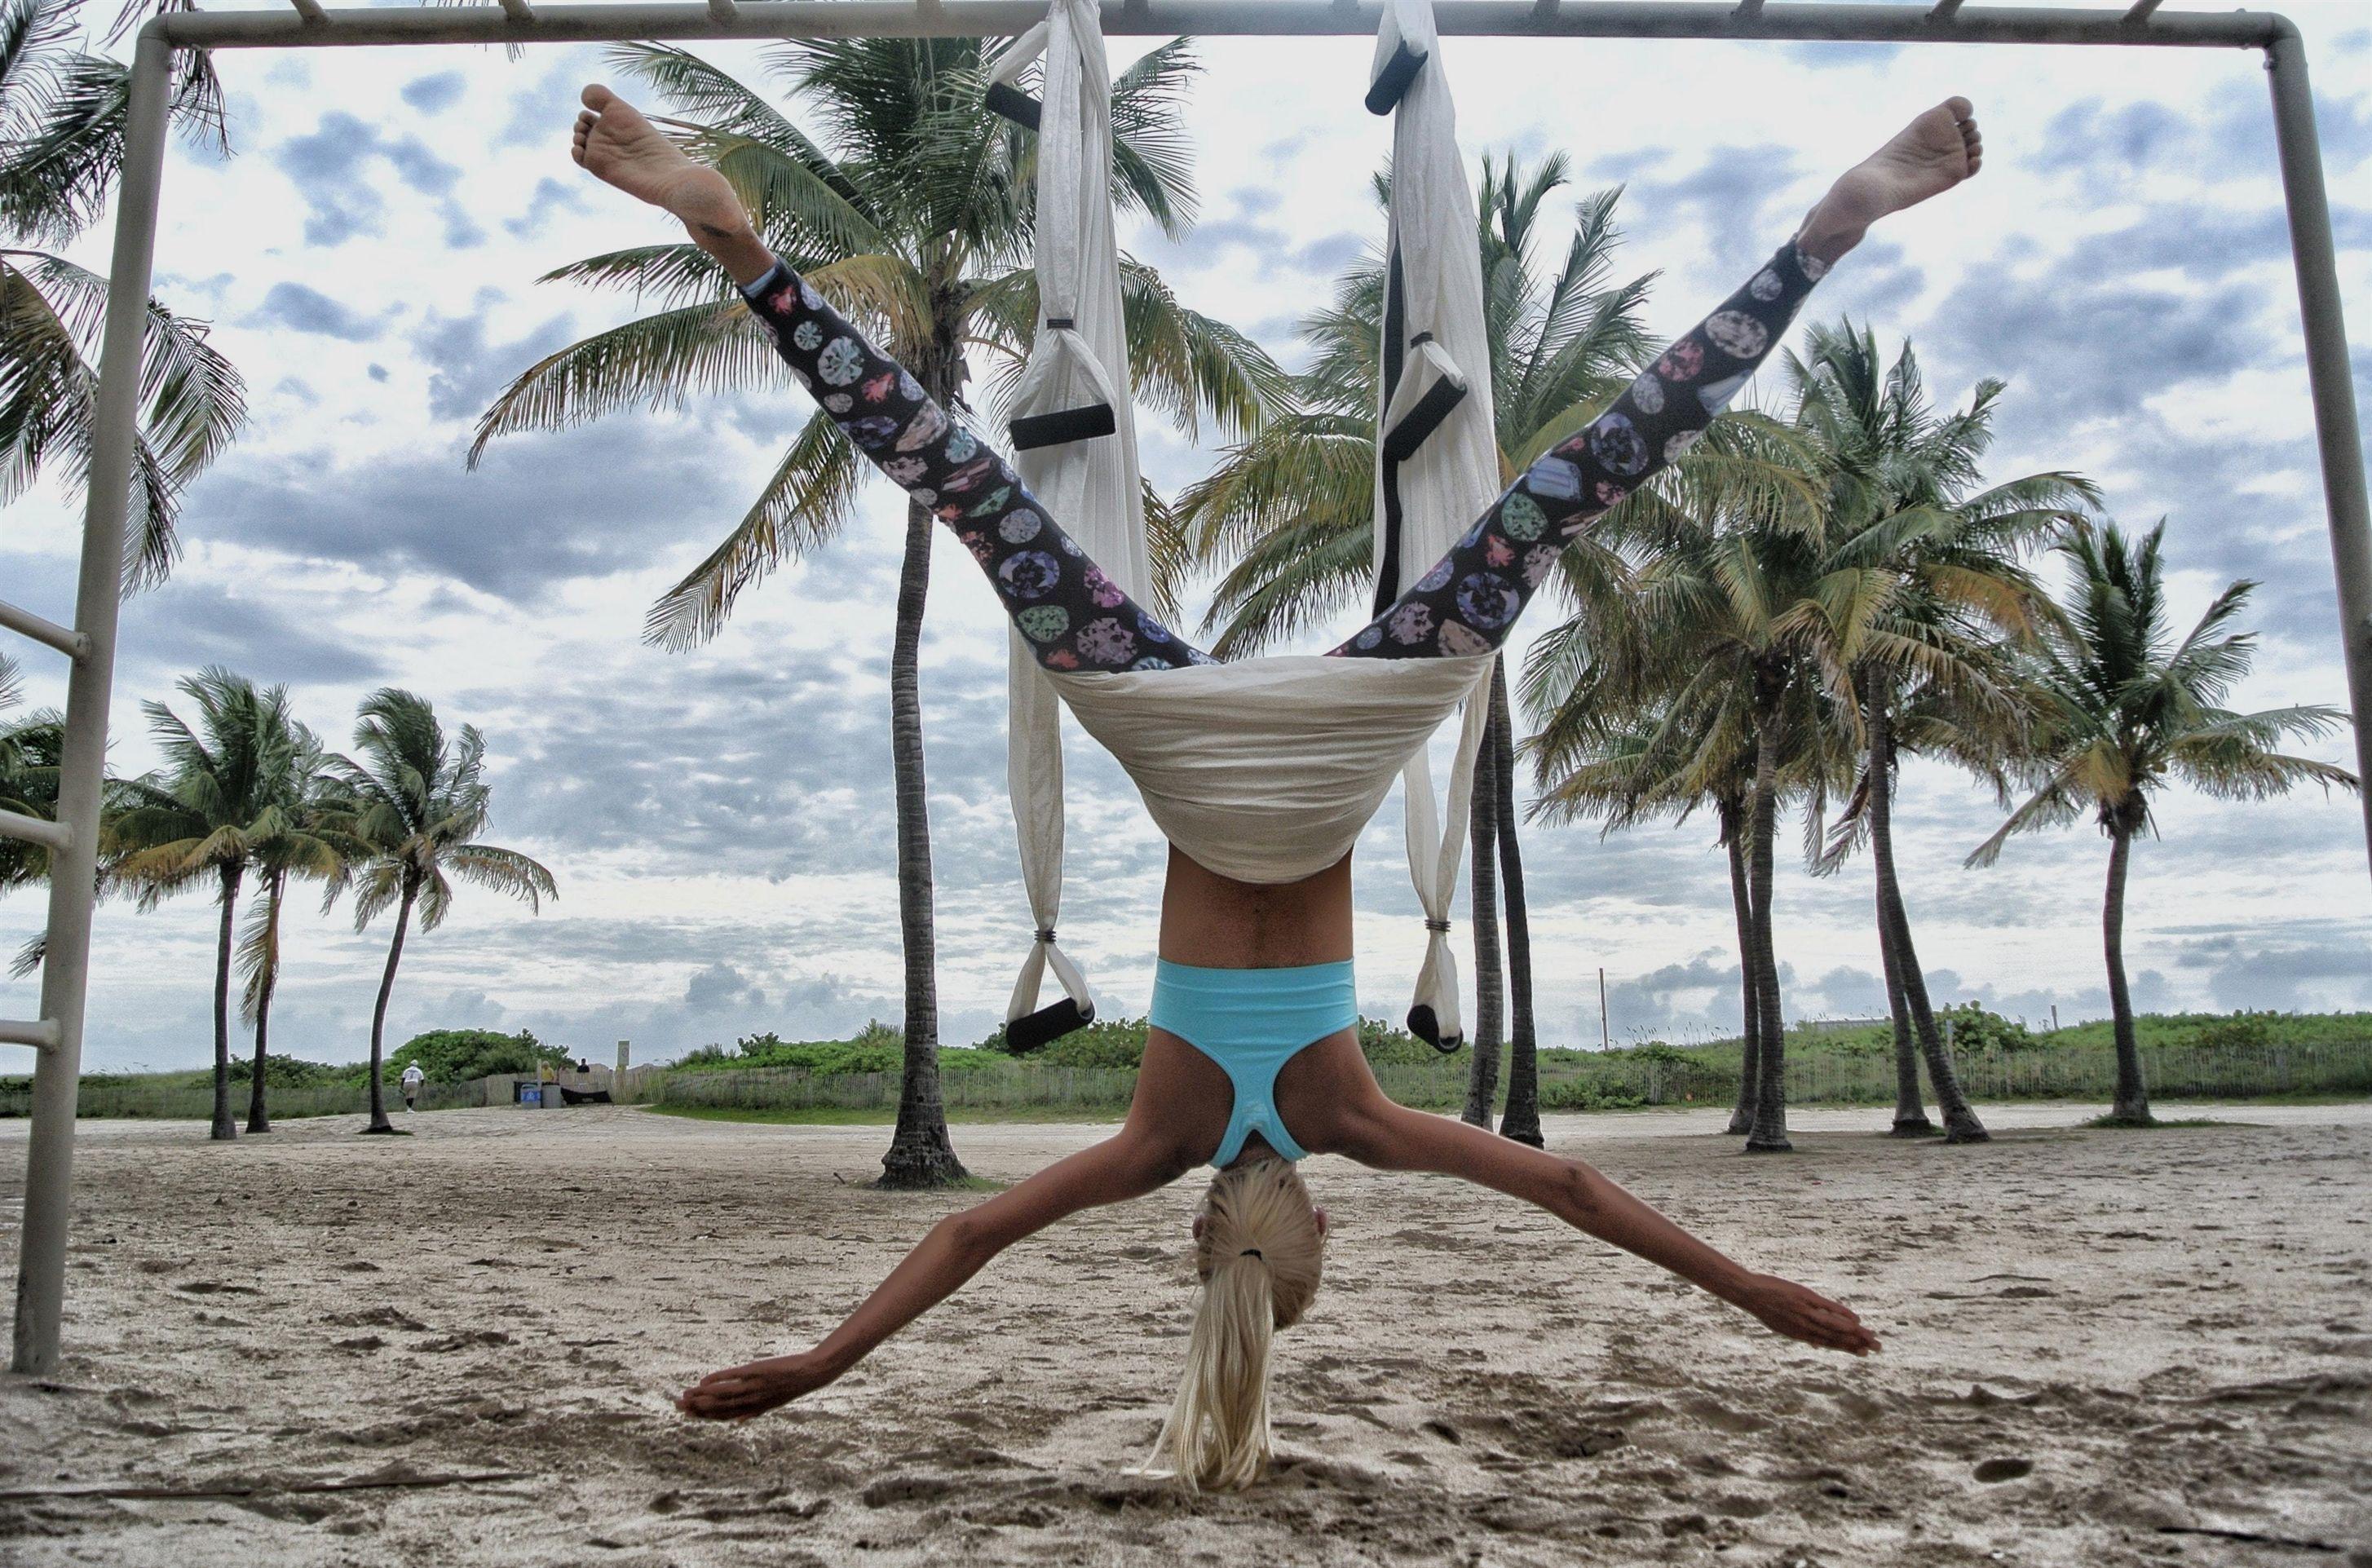 #fitnessuniverse #choreography #nutrition #baltimore #nederland #universe #programs #harmelen #exerc...